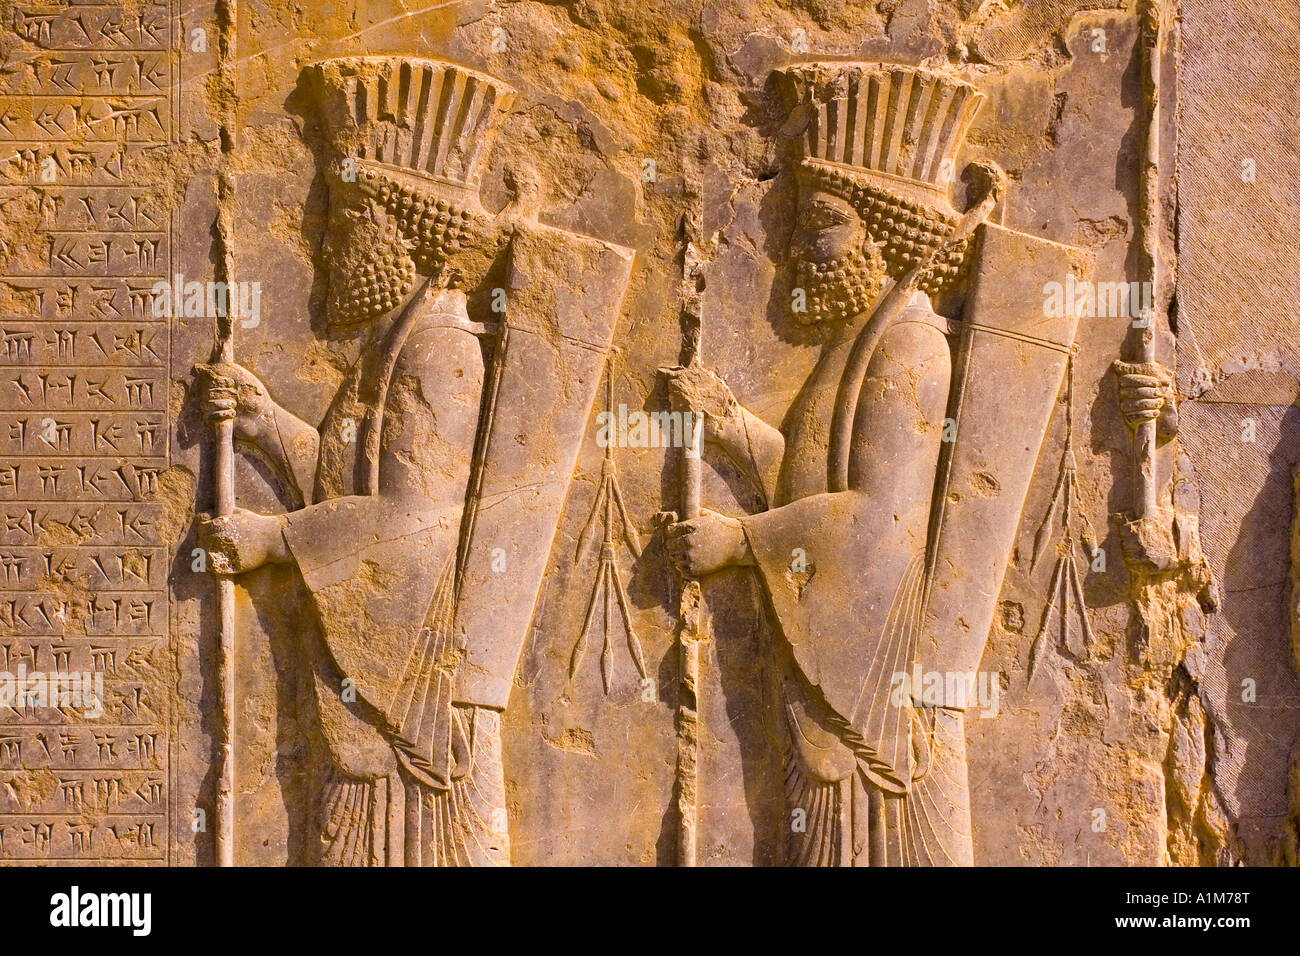 Bas reliefs, Persepolis, Fars Province, Iran - Stock Image